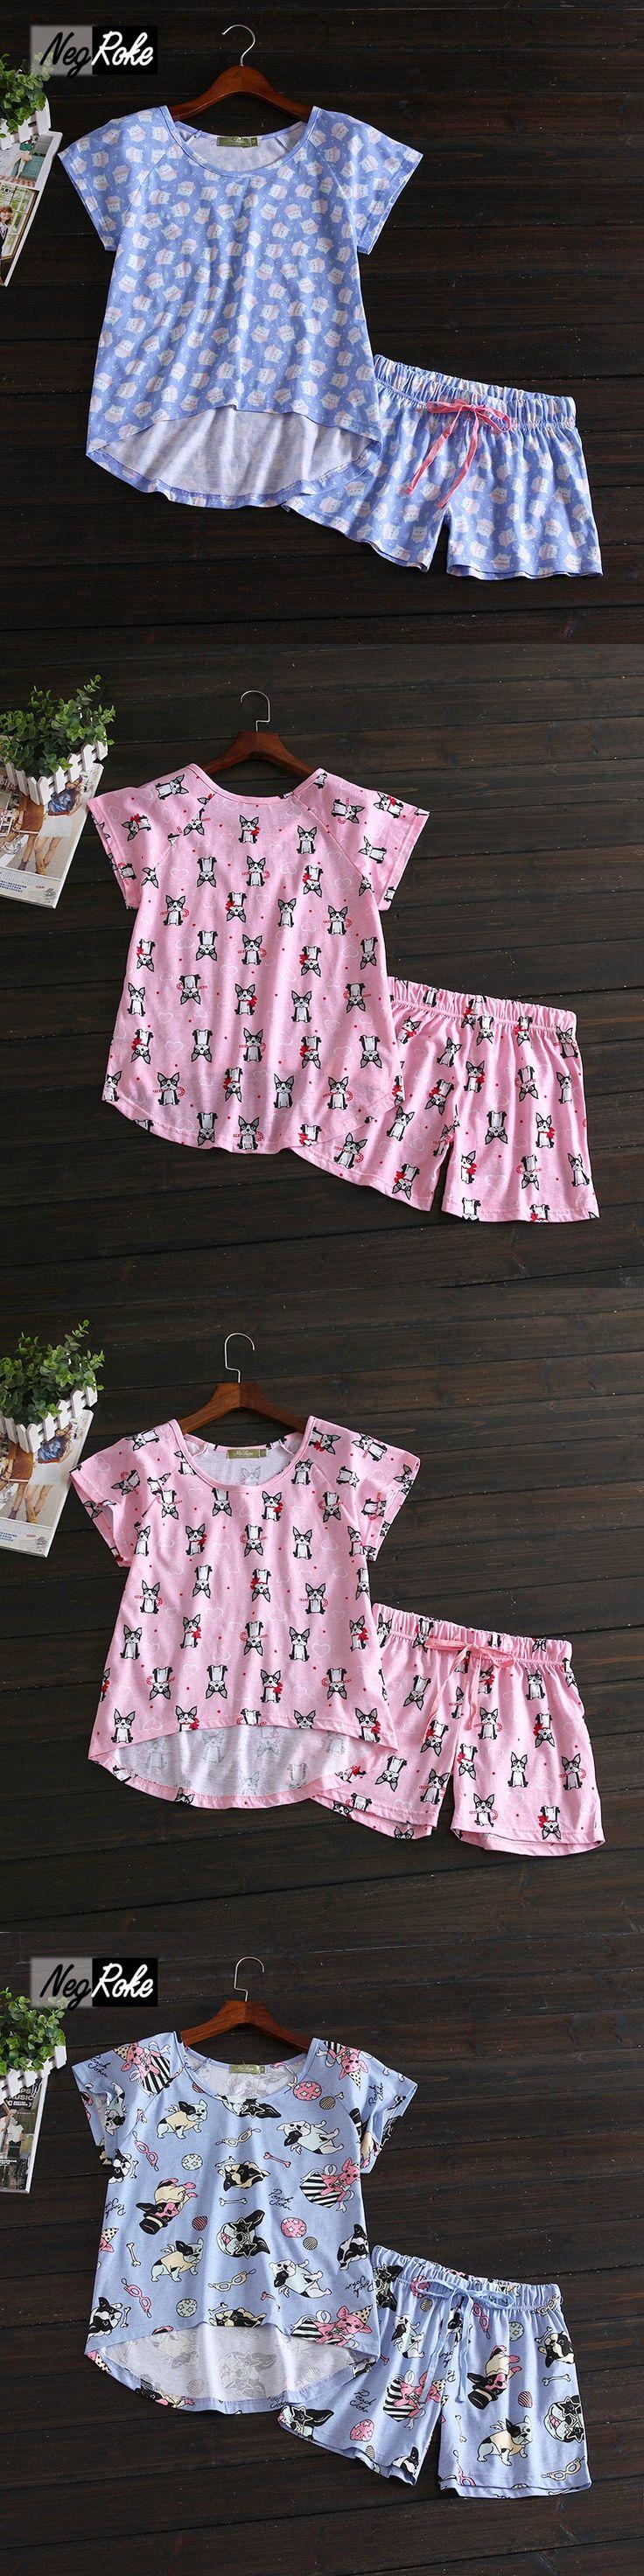 New Summer short sleeves shorts women Cute Simple  100% cotton women pajama sets homewear for ladies sleepwear pyjamas women